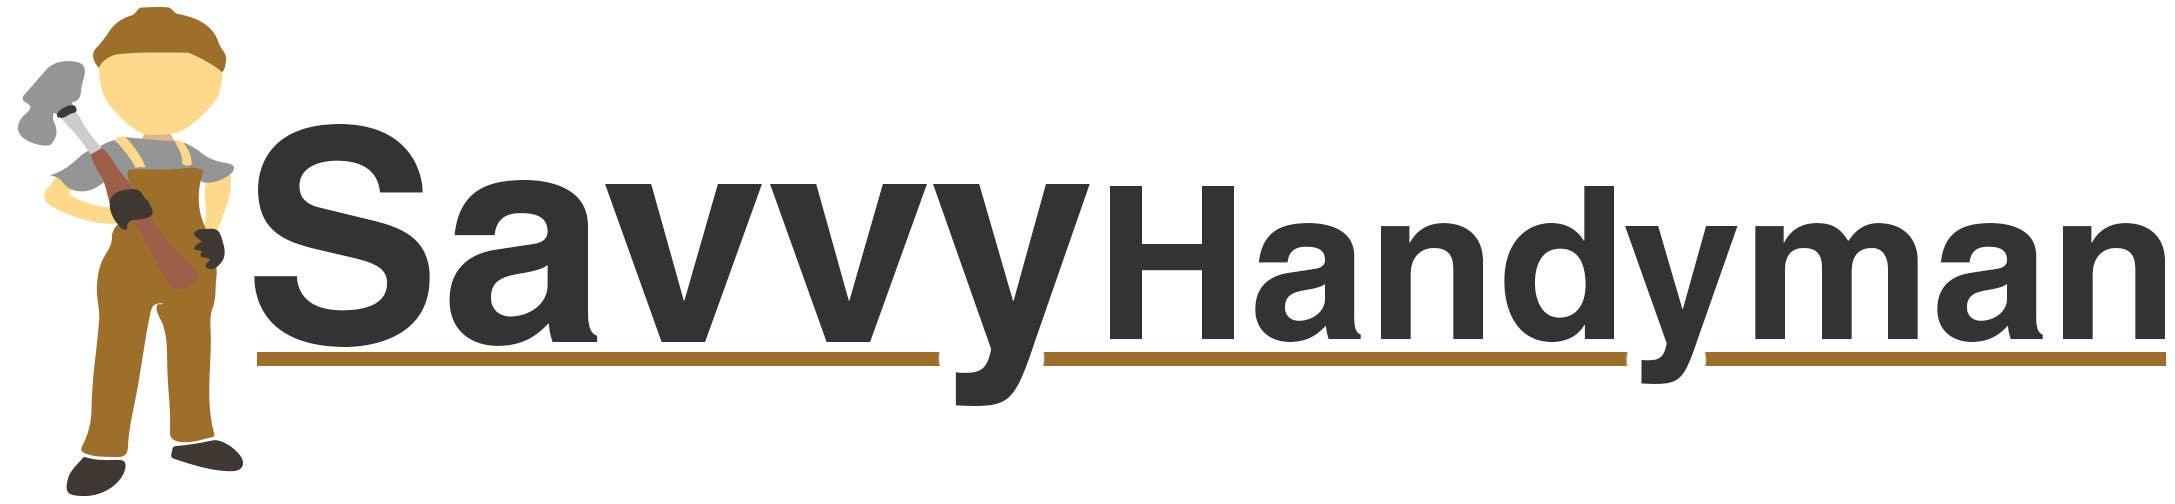 Bài tham dự cuộc thi #41 cho Design a Logo for new handyman site